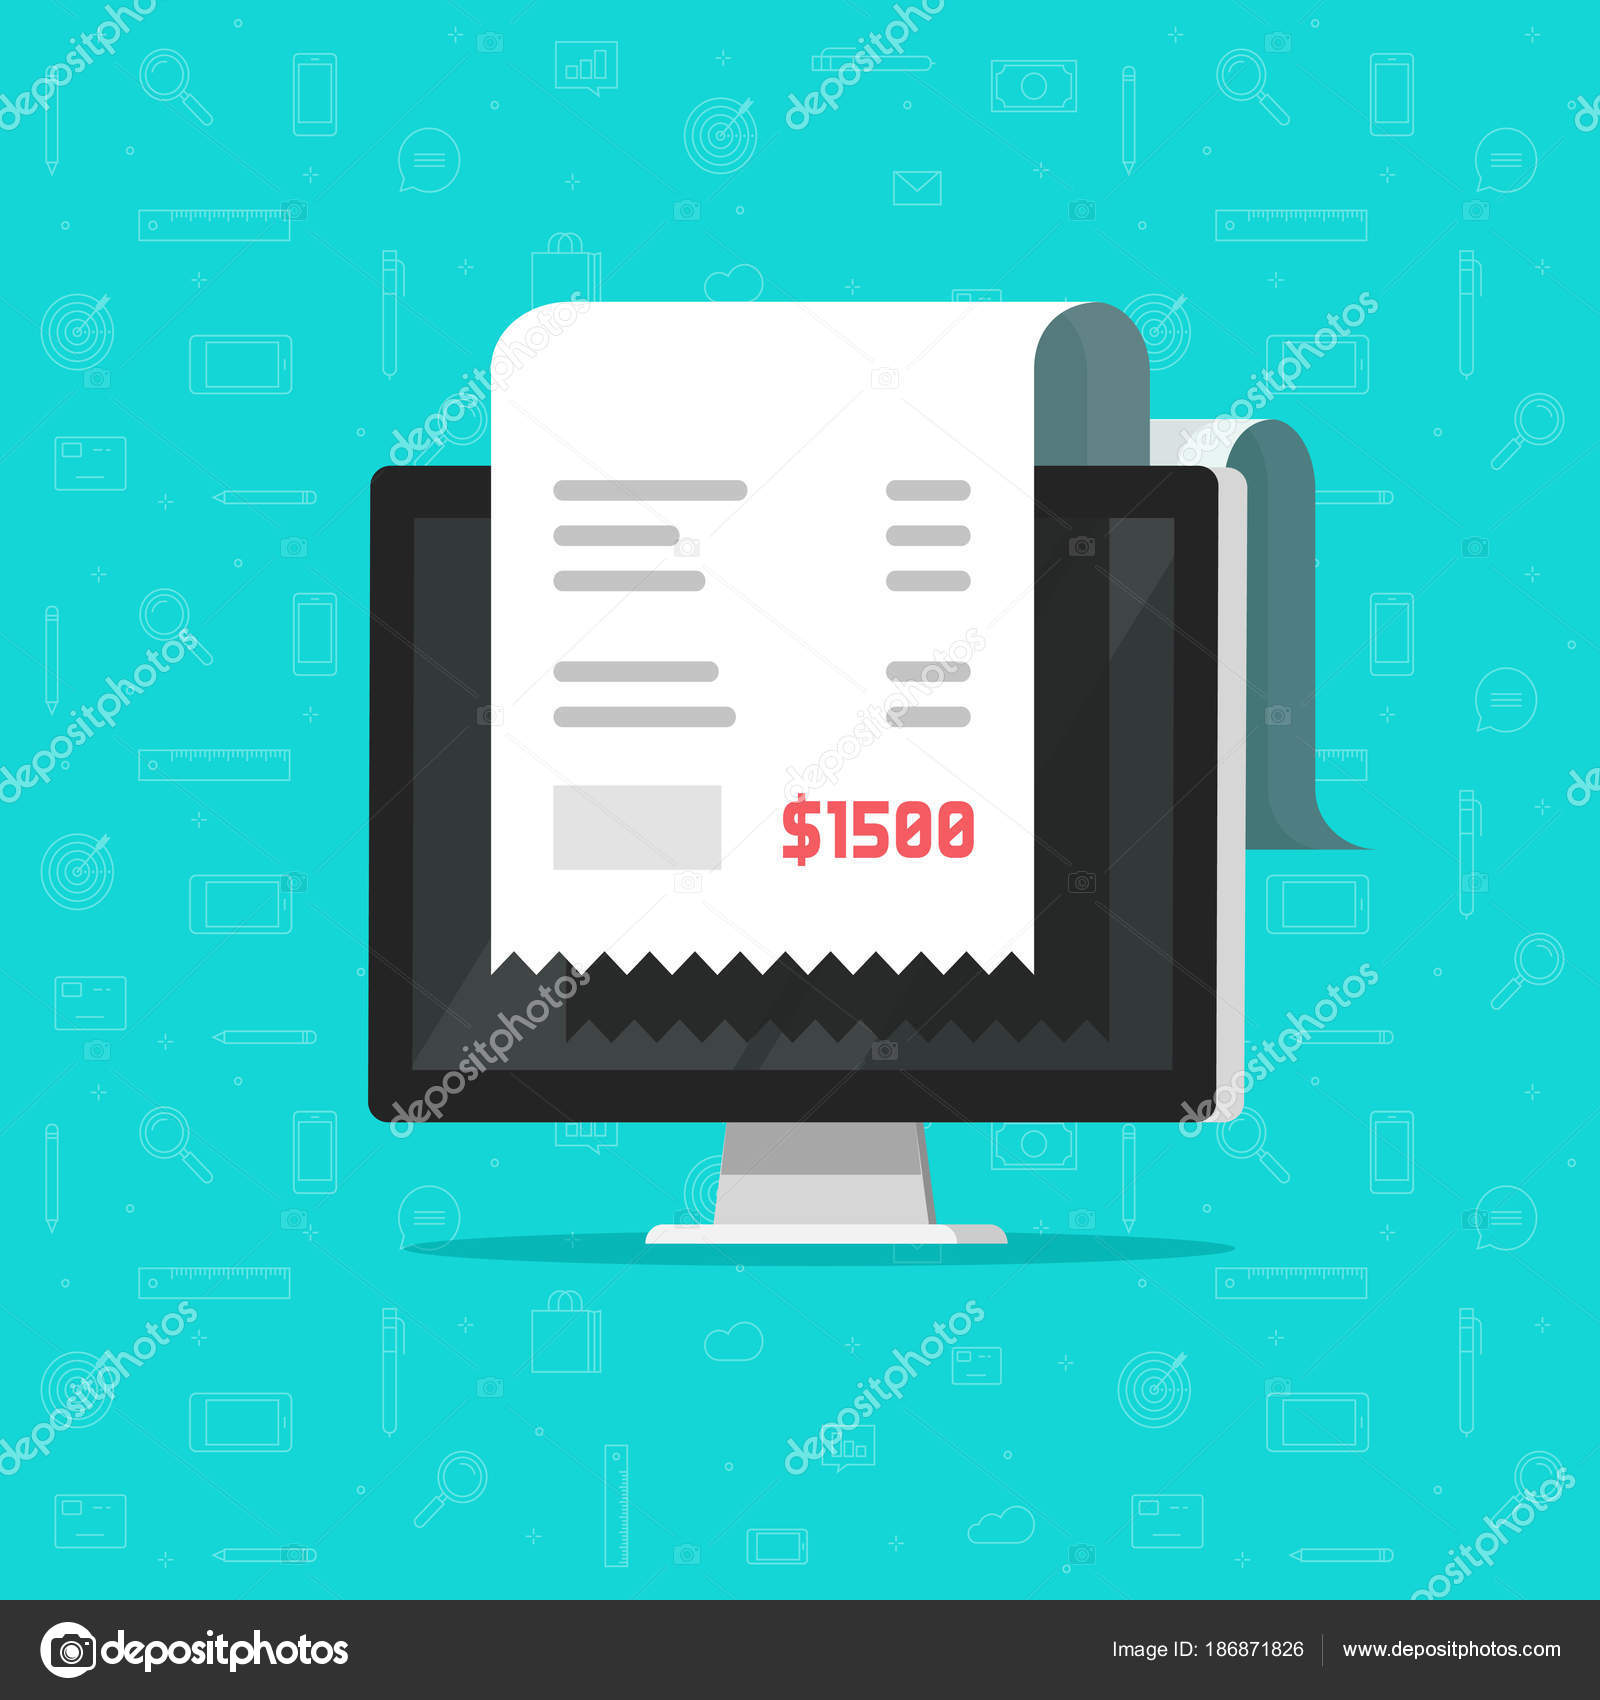 computer and receipt vector illustration cartoon big bill tax or